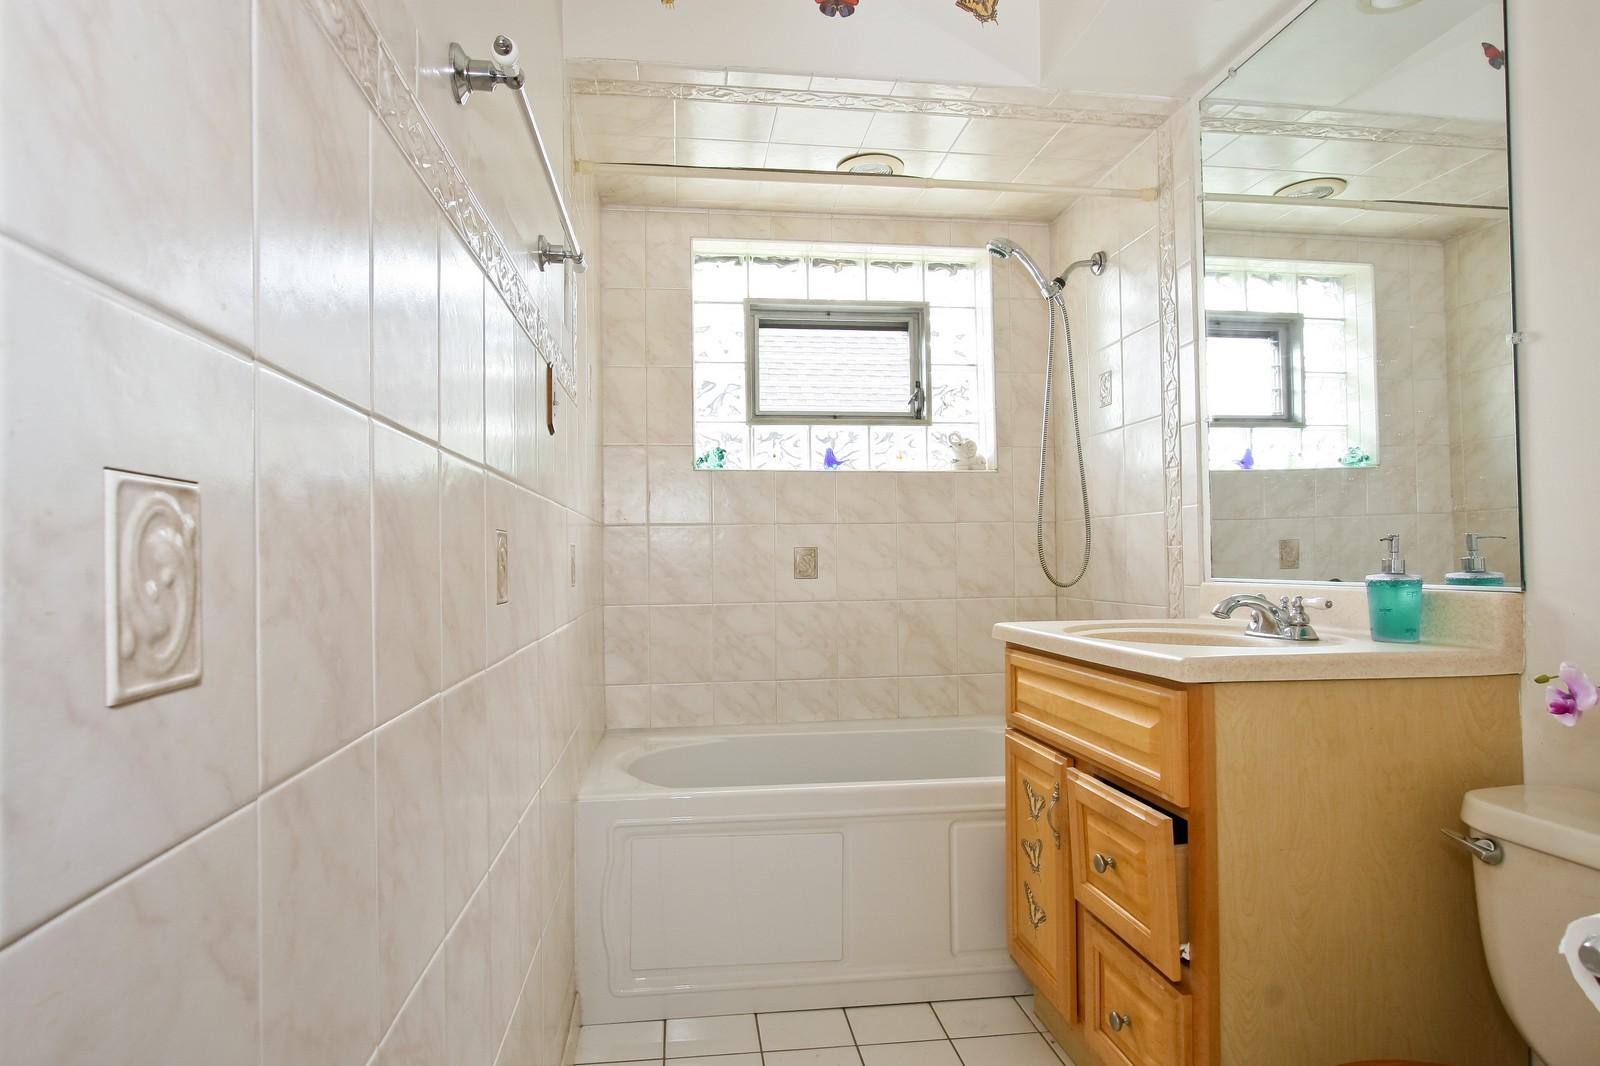 Real Estate Photography - 5813 S Natoma, Chicago, IL, 60638 - Bathroom